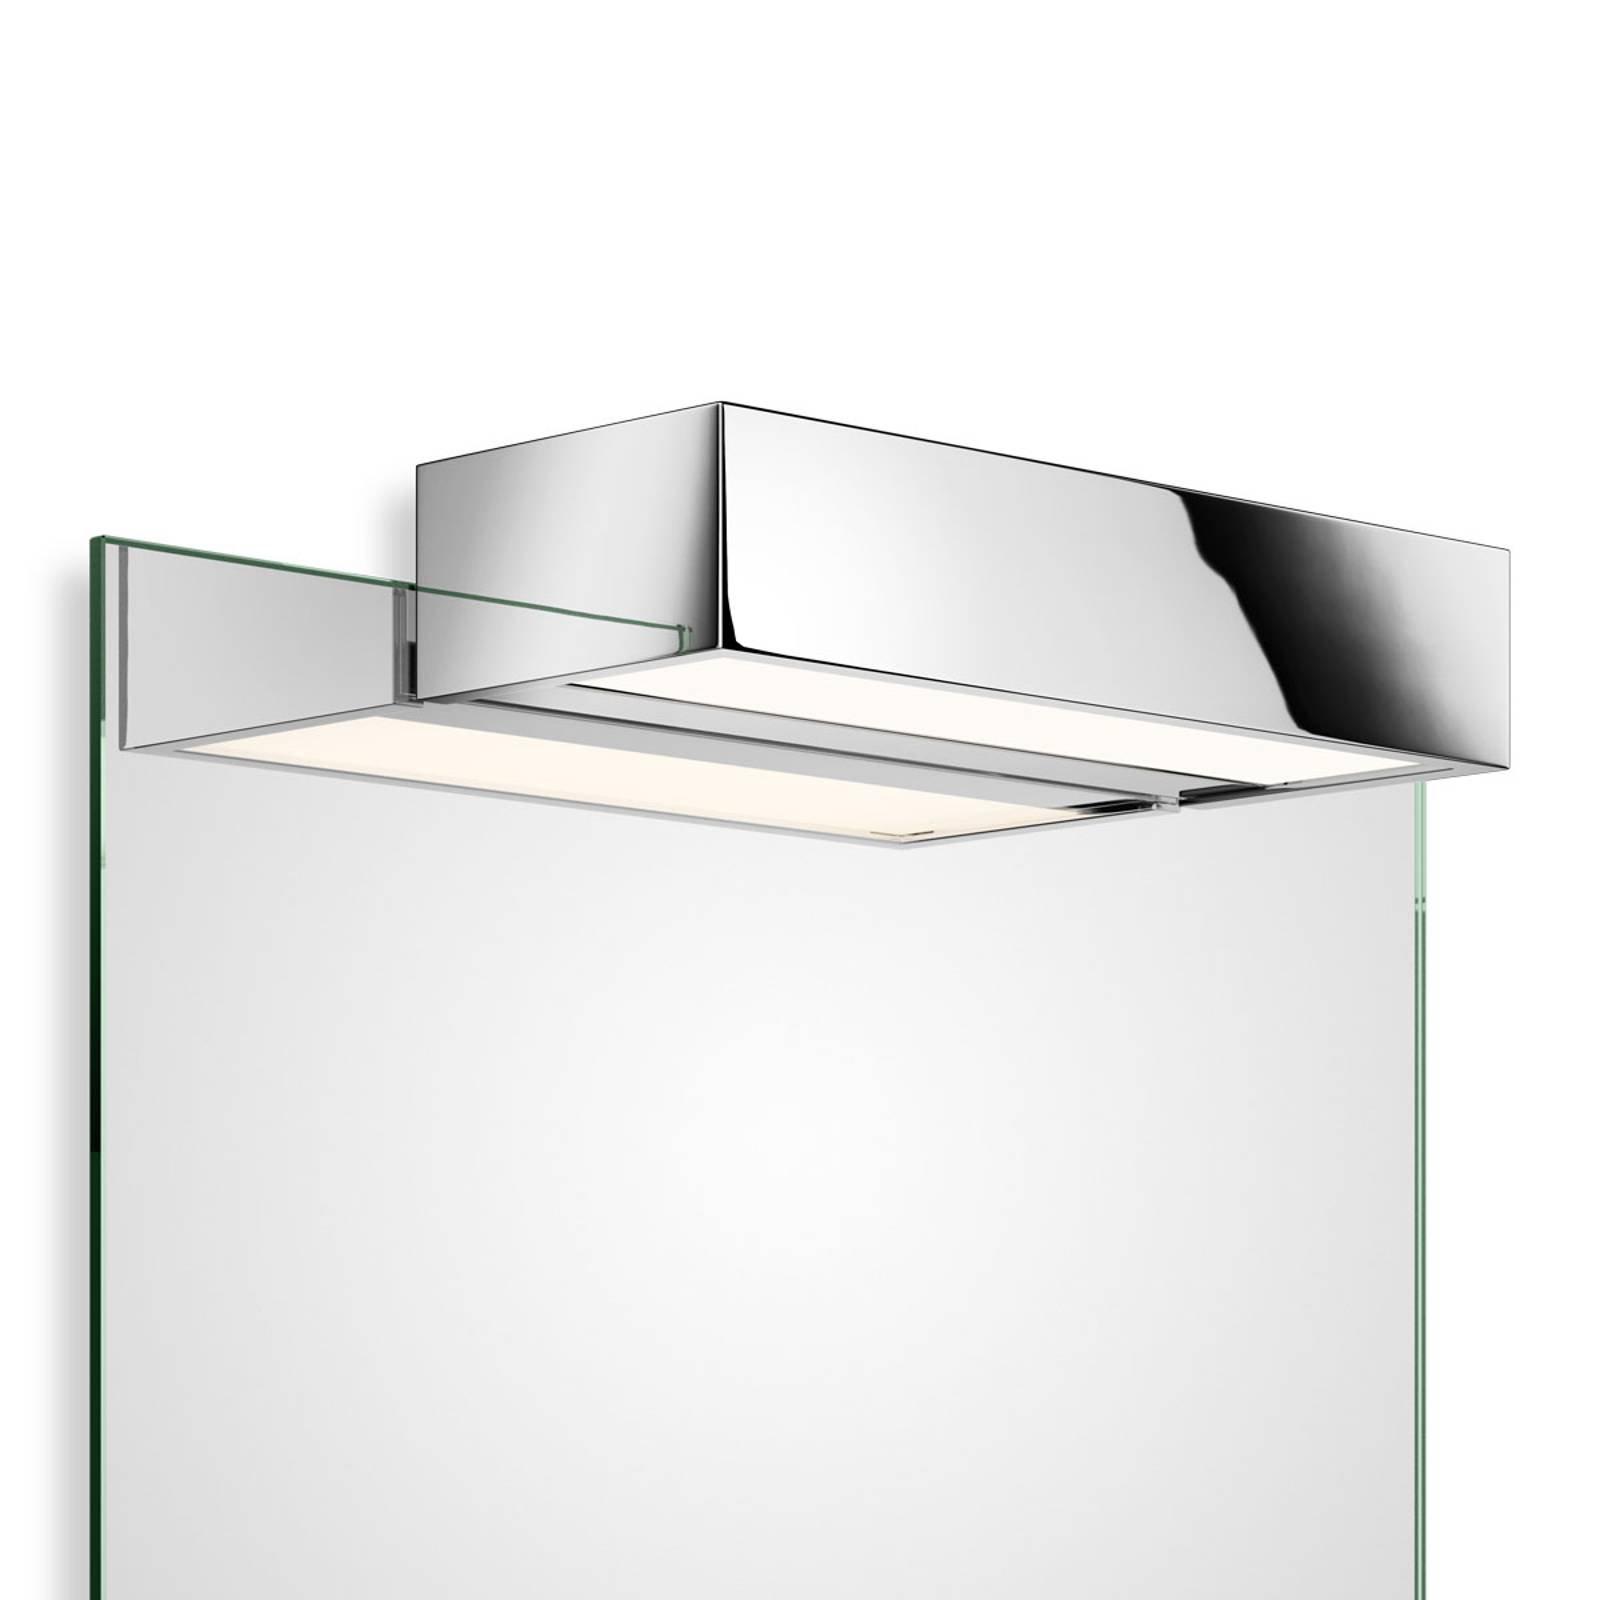 Decor Walther-boks 1-15 N LED-speillampe 2 700 K